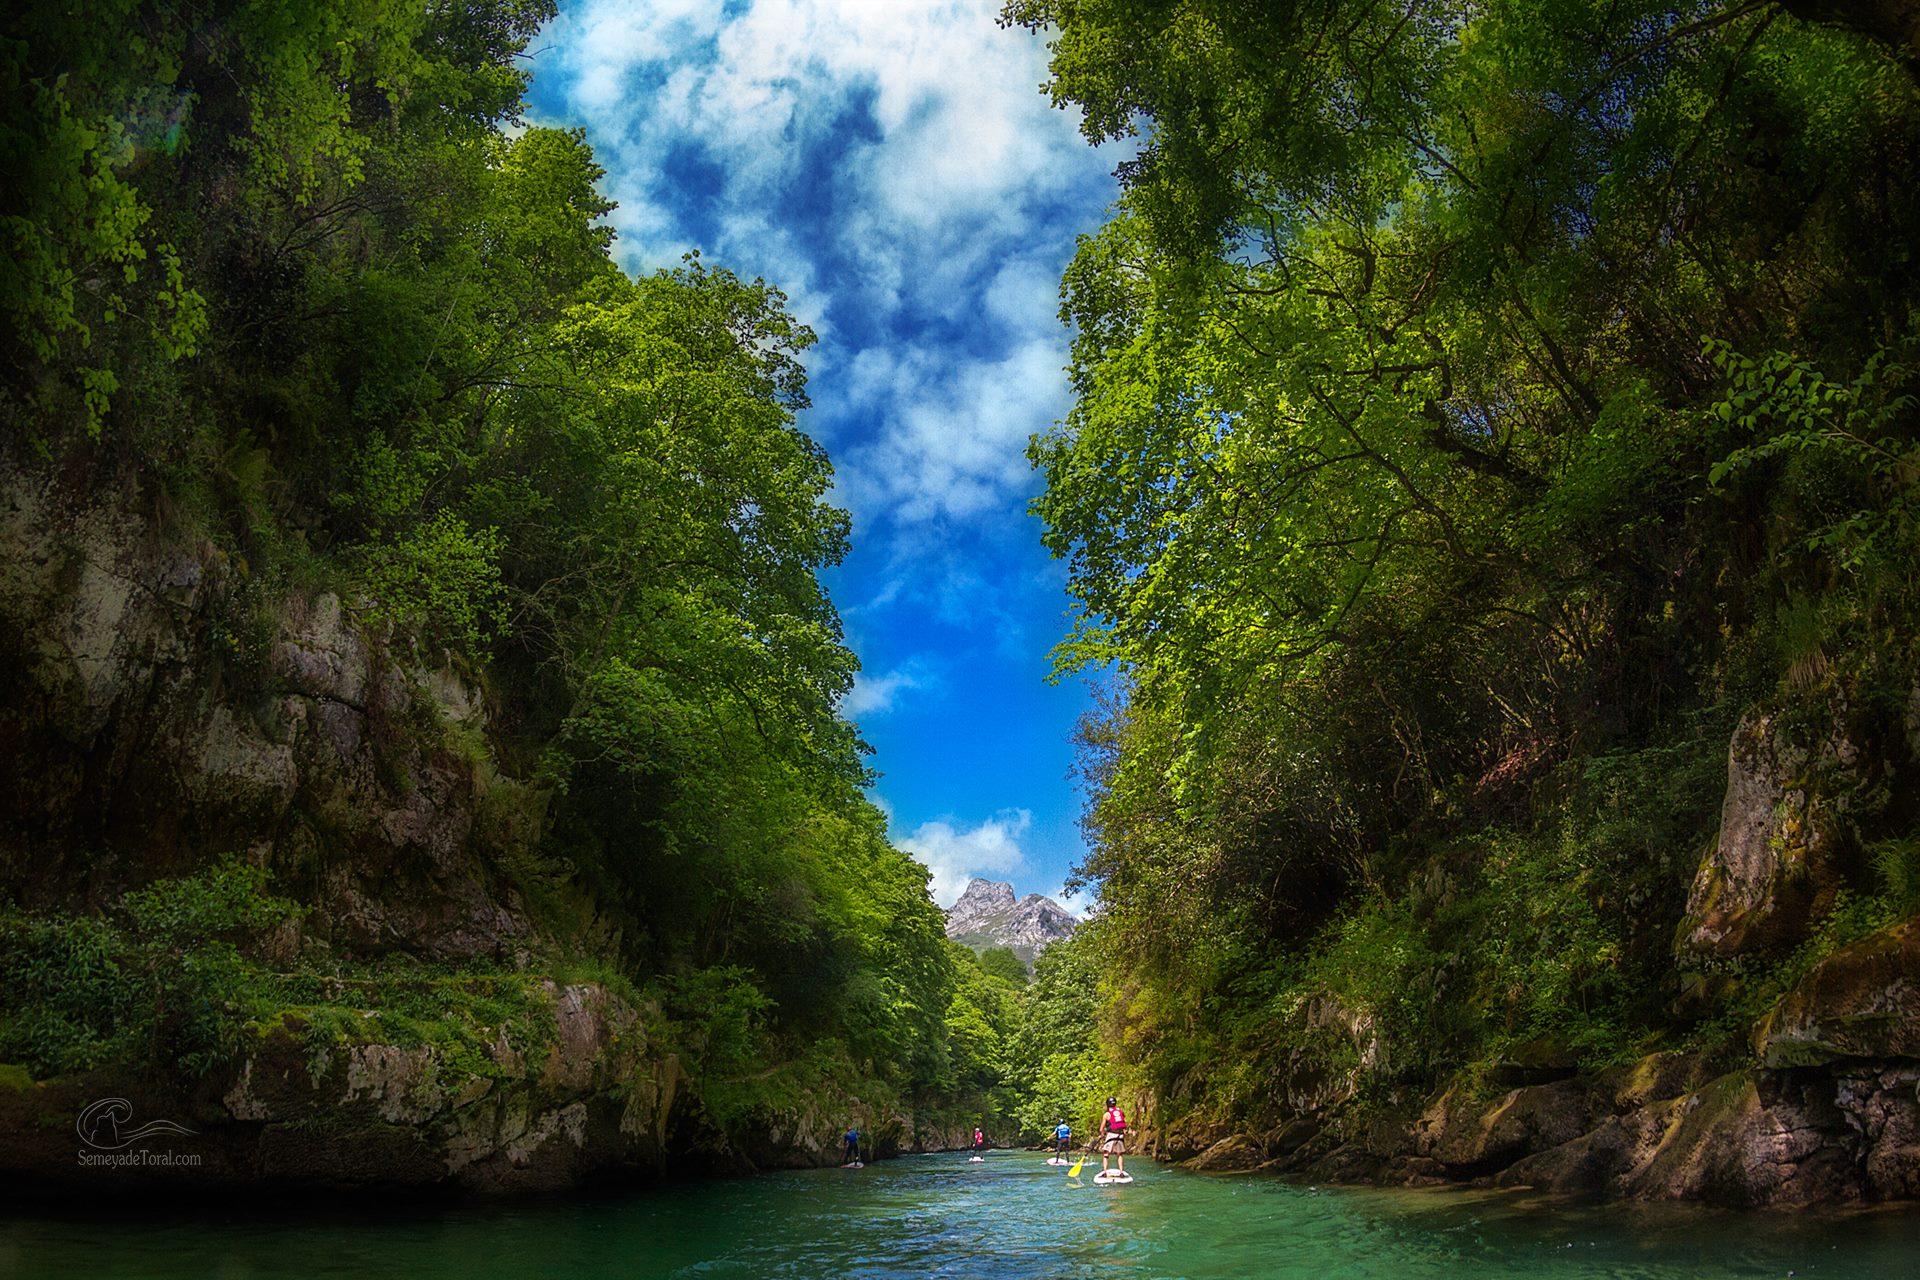 Remando en plena selva - STAND UP PADDLE SURF - Semeya  de Toral